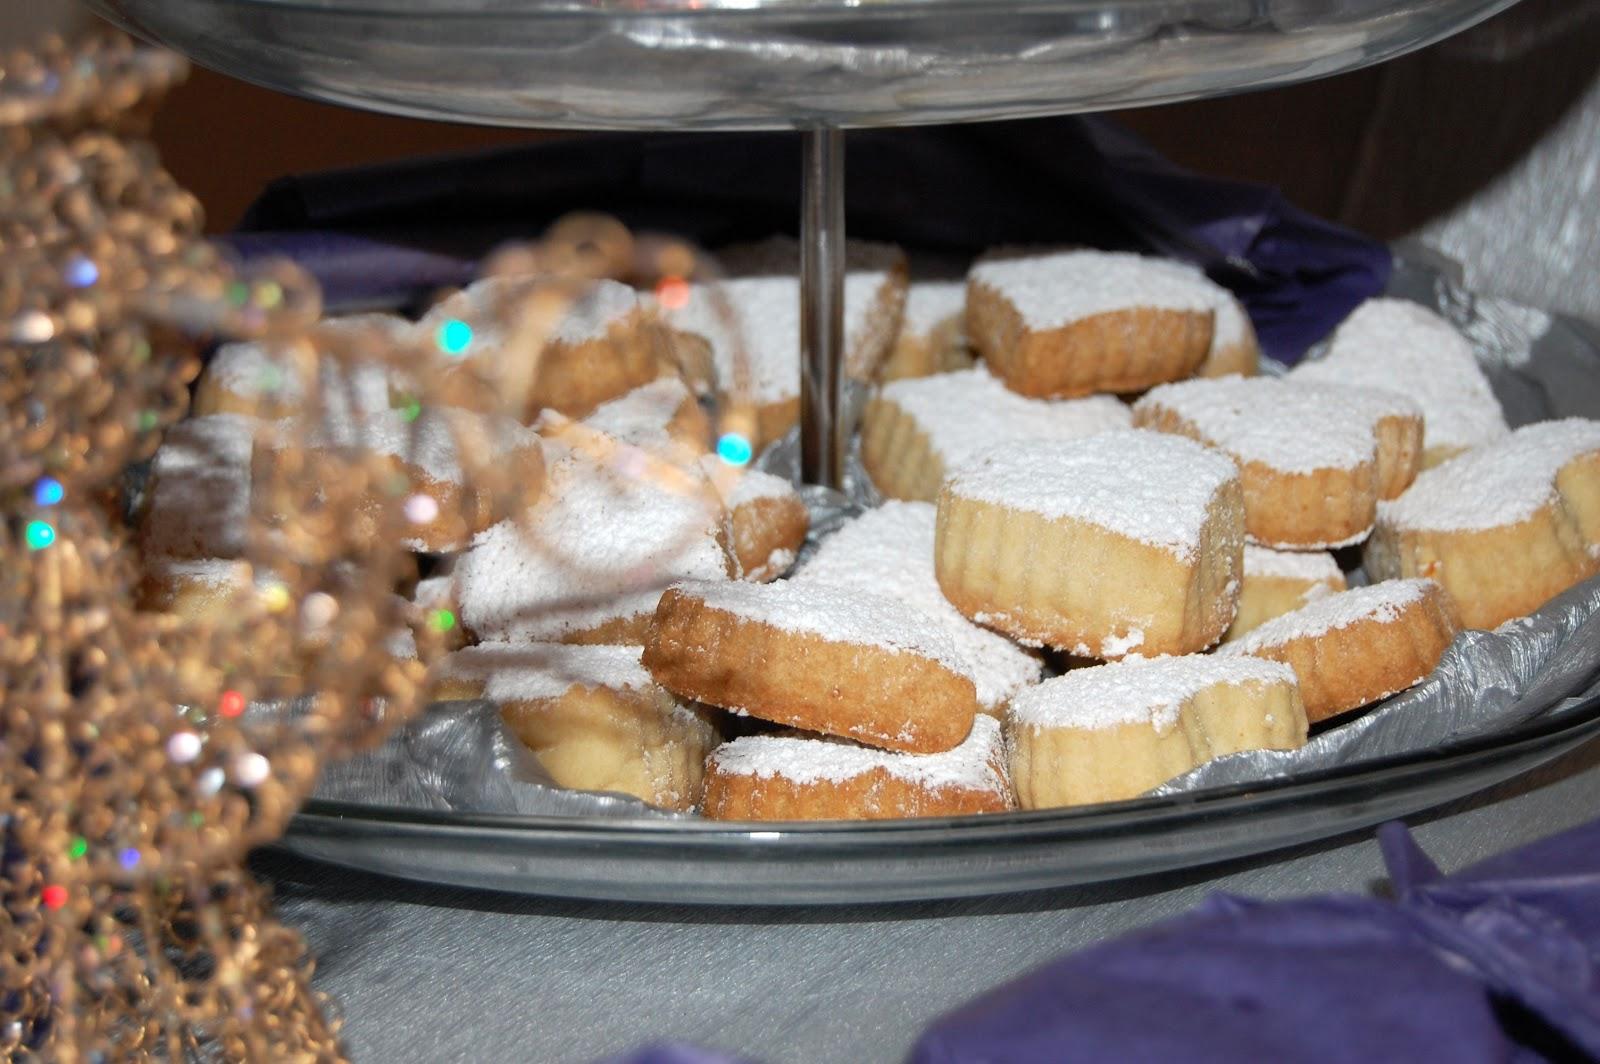 http://azucarenmicocina.blogspot.com.es/2012/12/navidad-navidad-dulce-navidad-1-parte.html